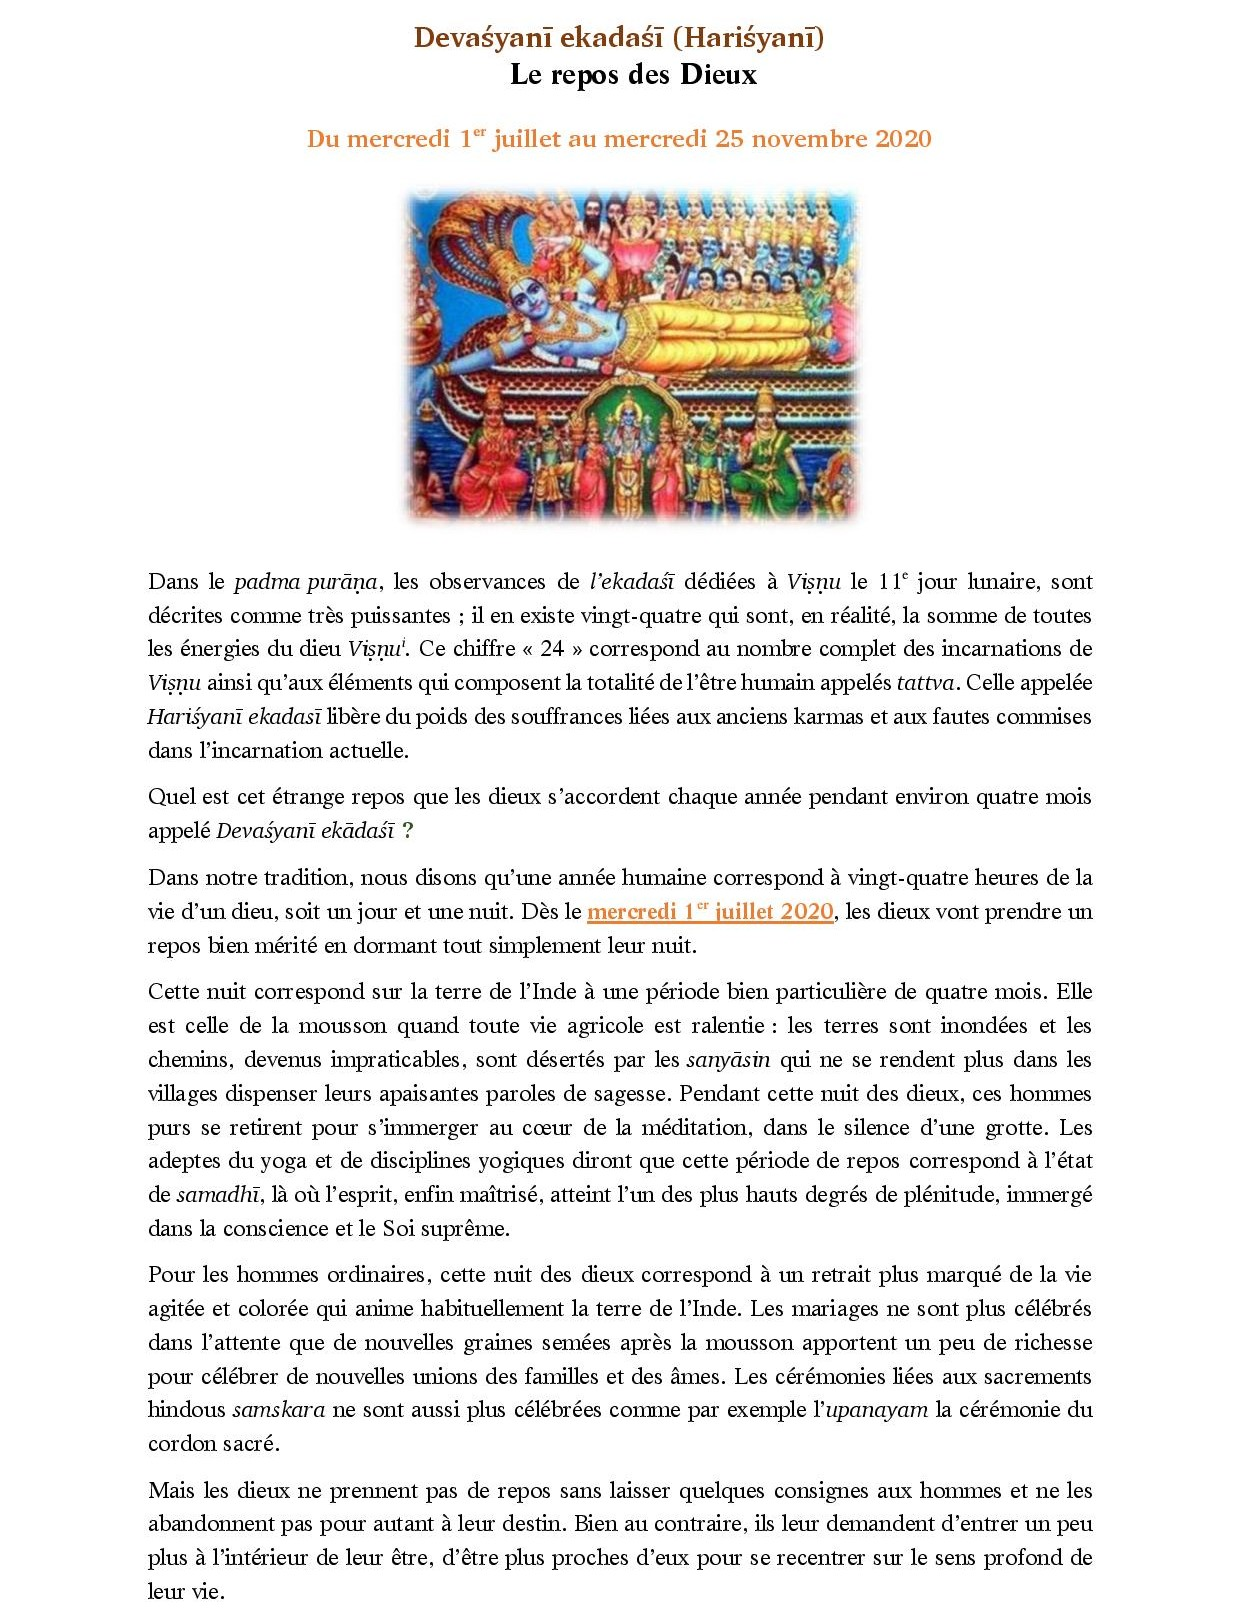 Devasyani ekadashi texte-page-001